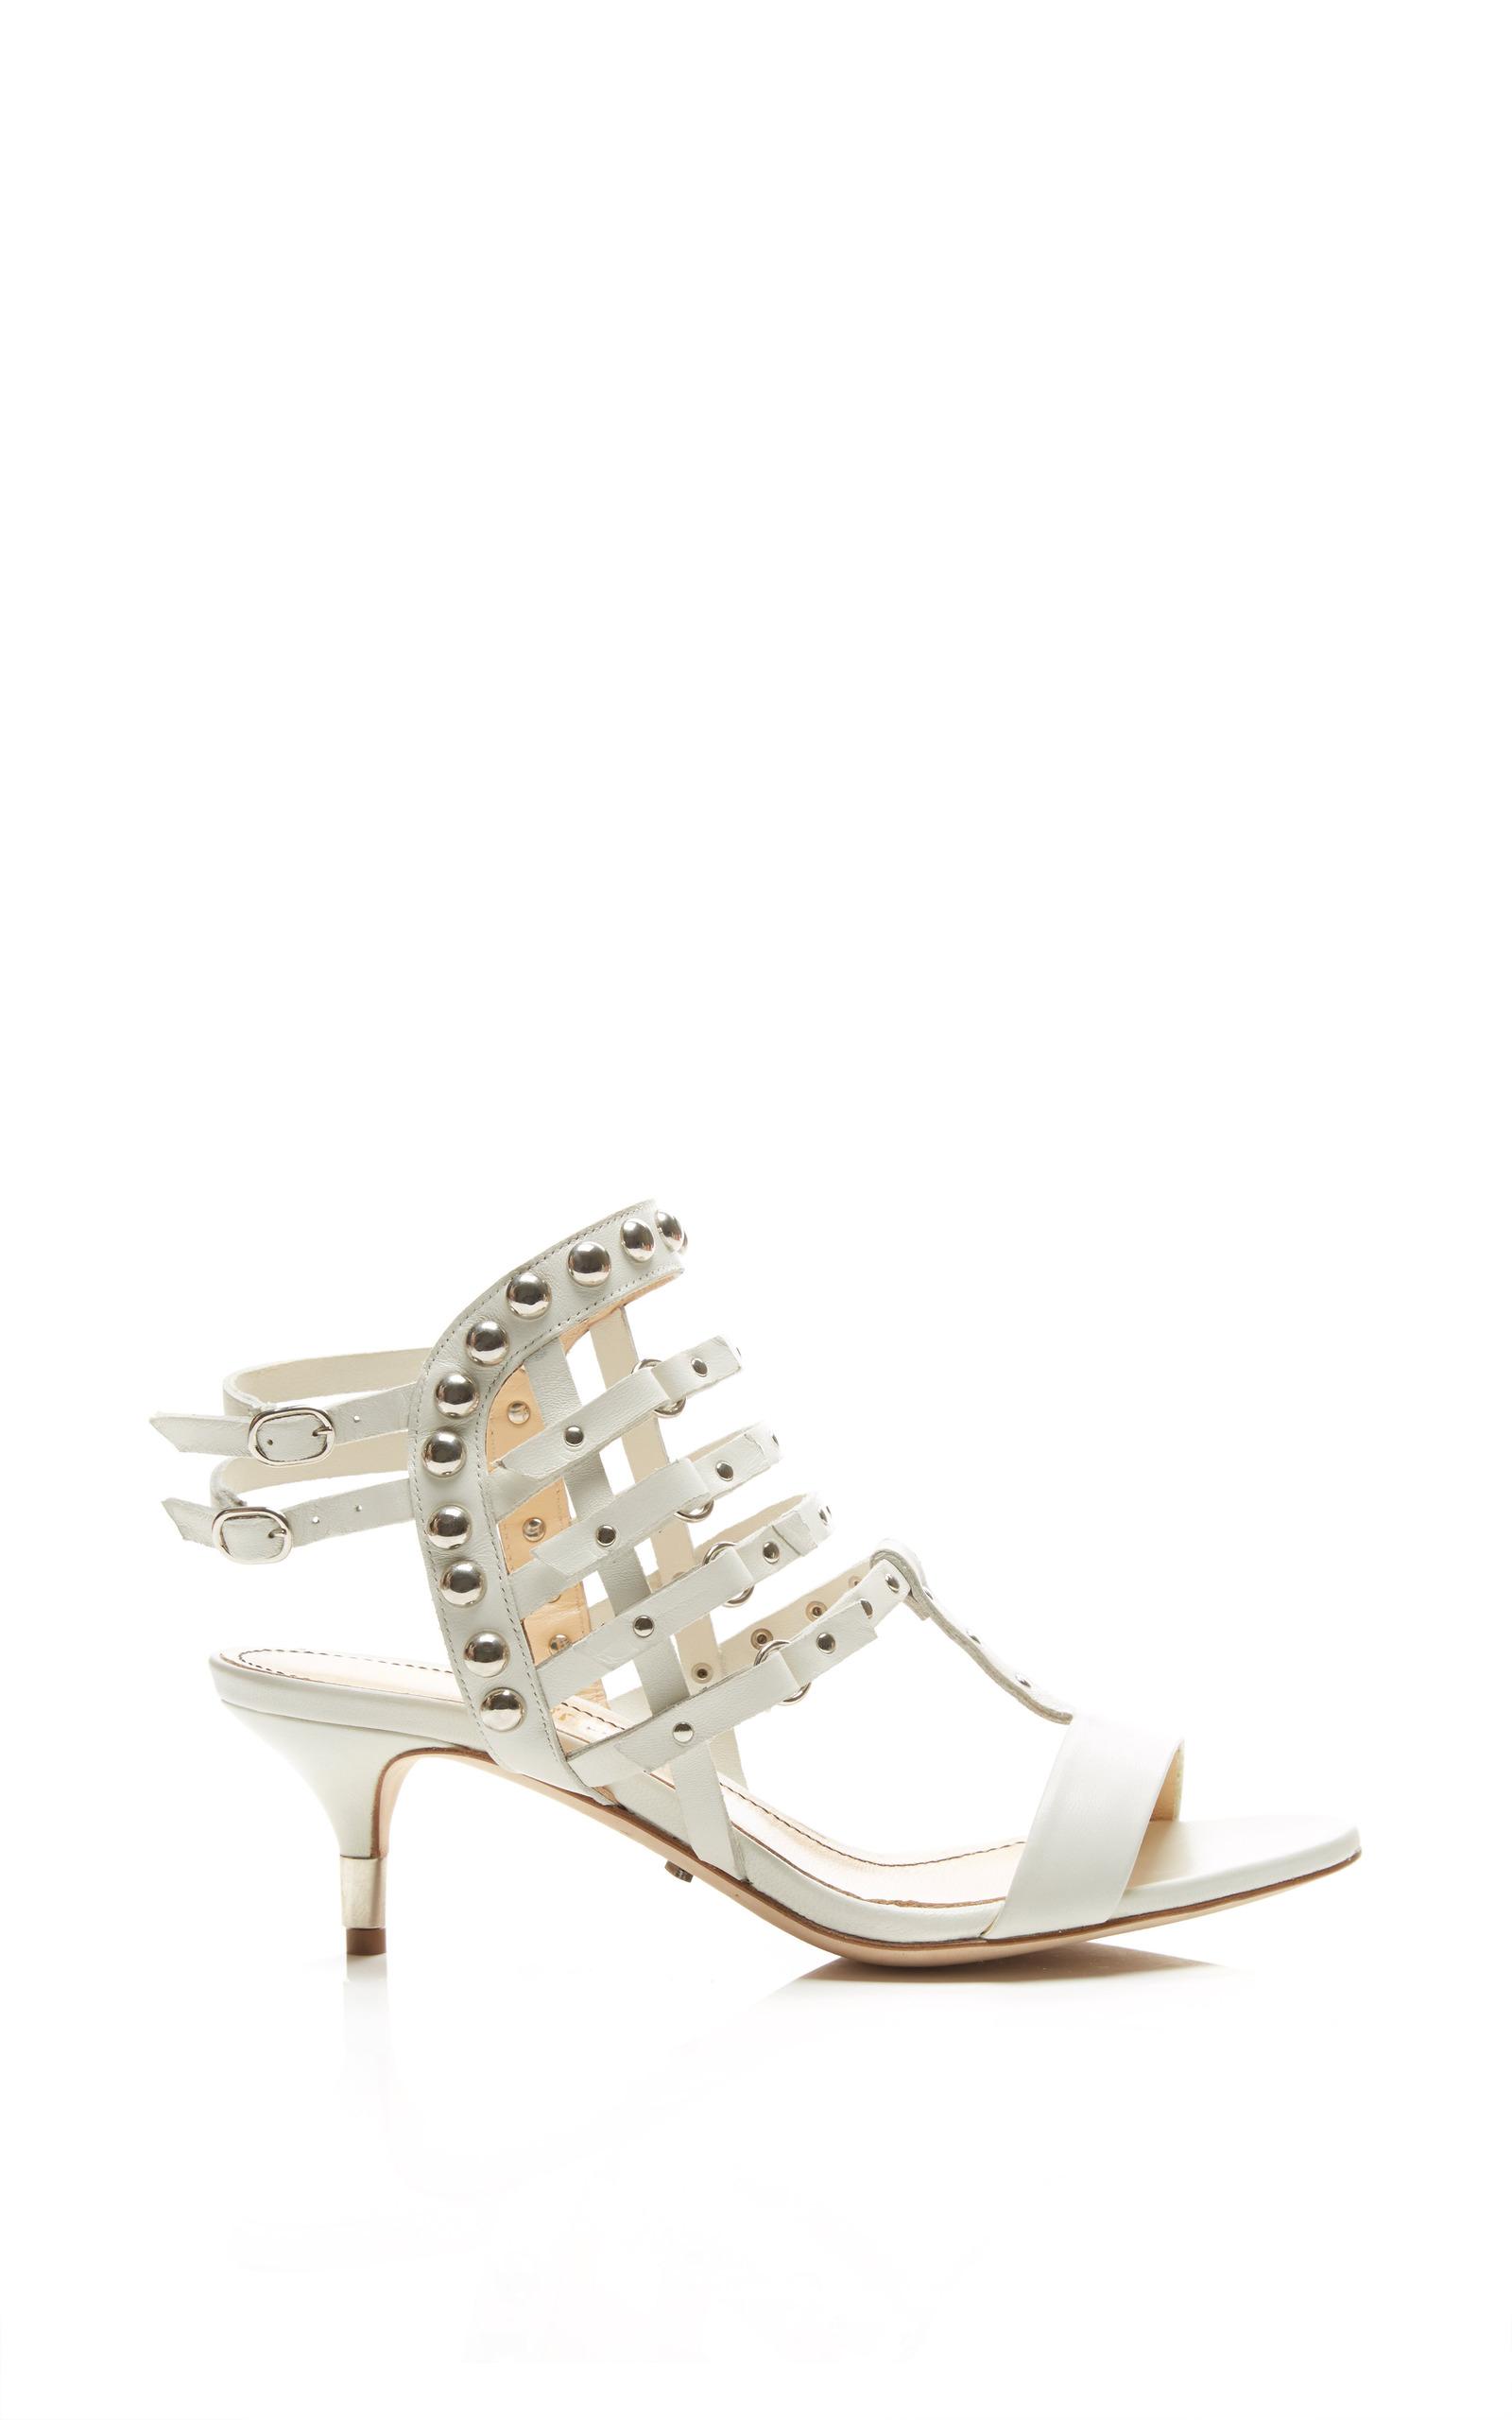 48d6e7bc1d0 Camden Kitten Heel Sandal In White by Jerome C. Rousseau